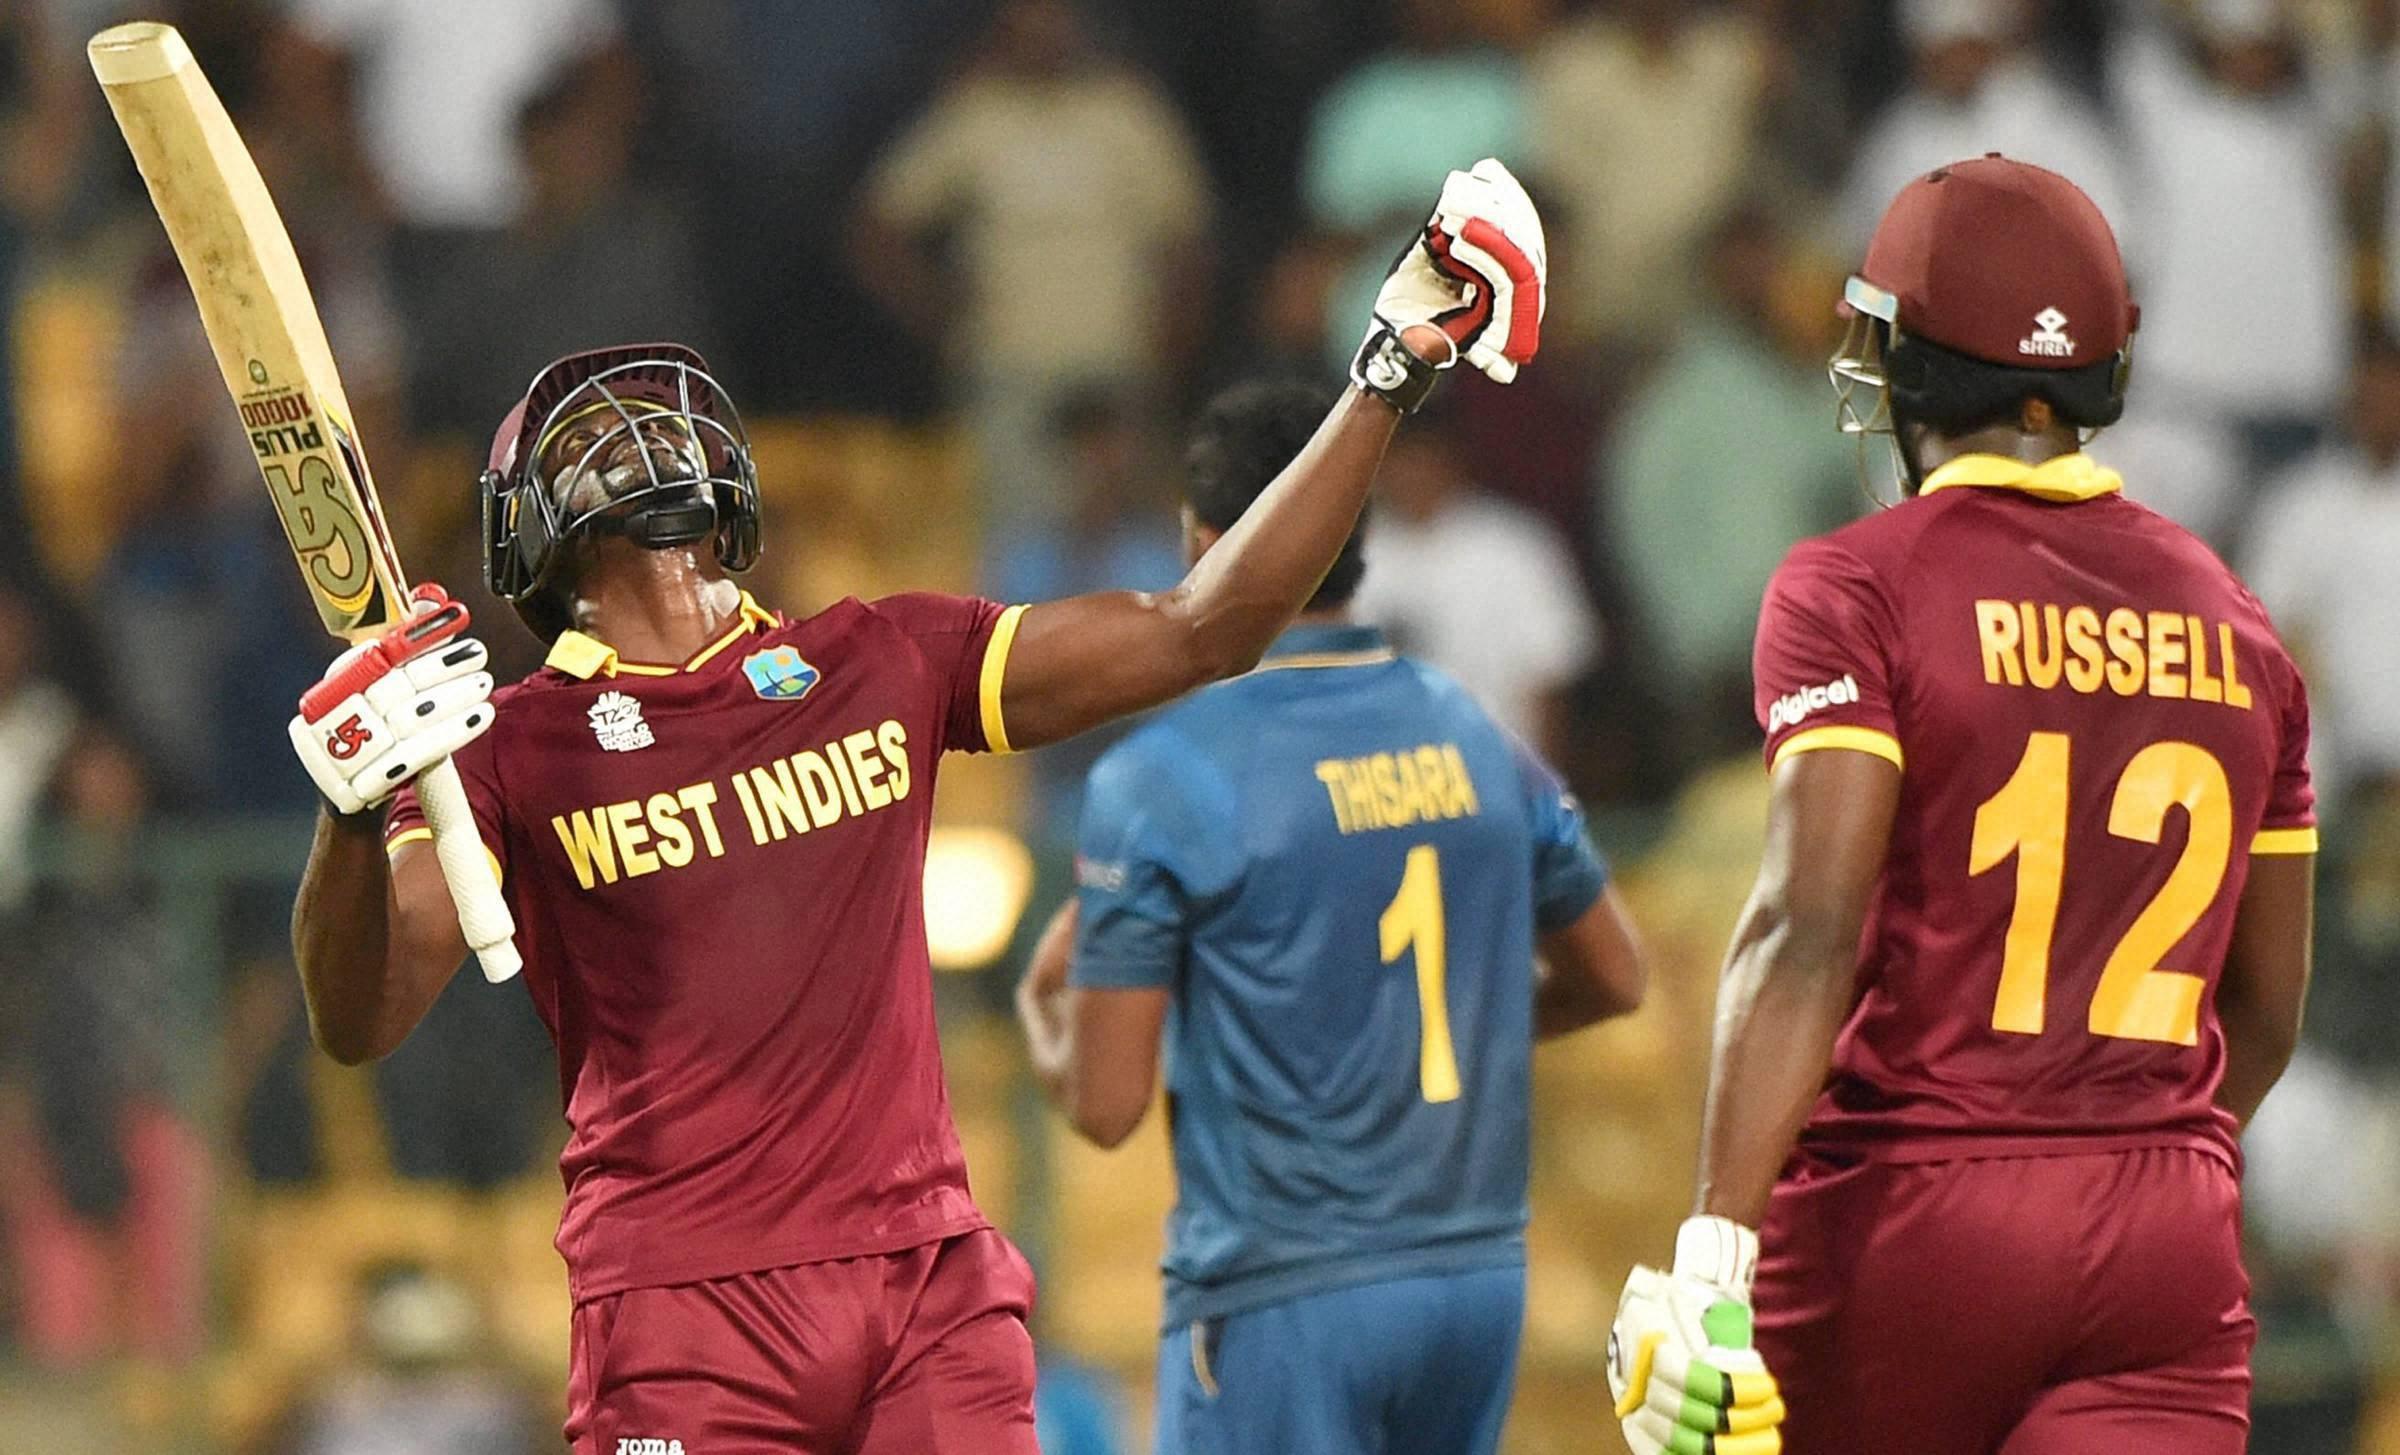 West Indies beat Sri Lanka by seven wickets in World T20